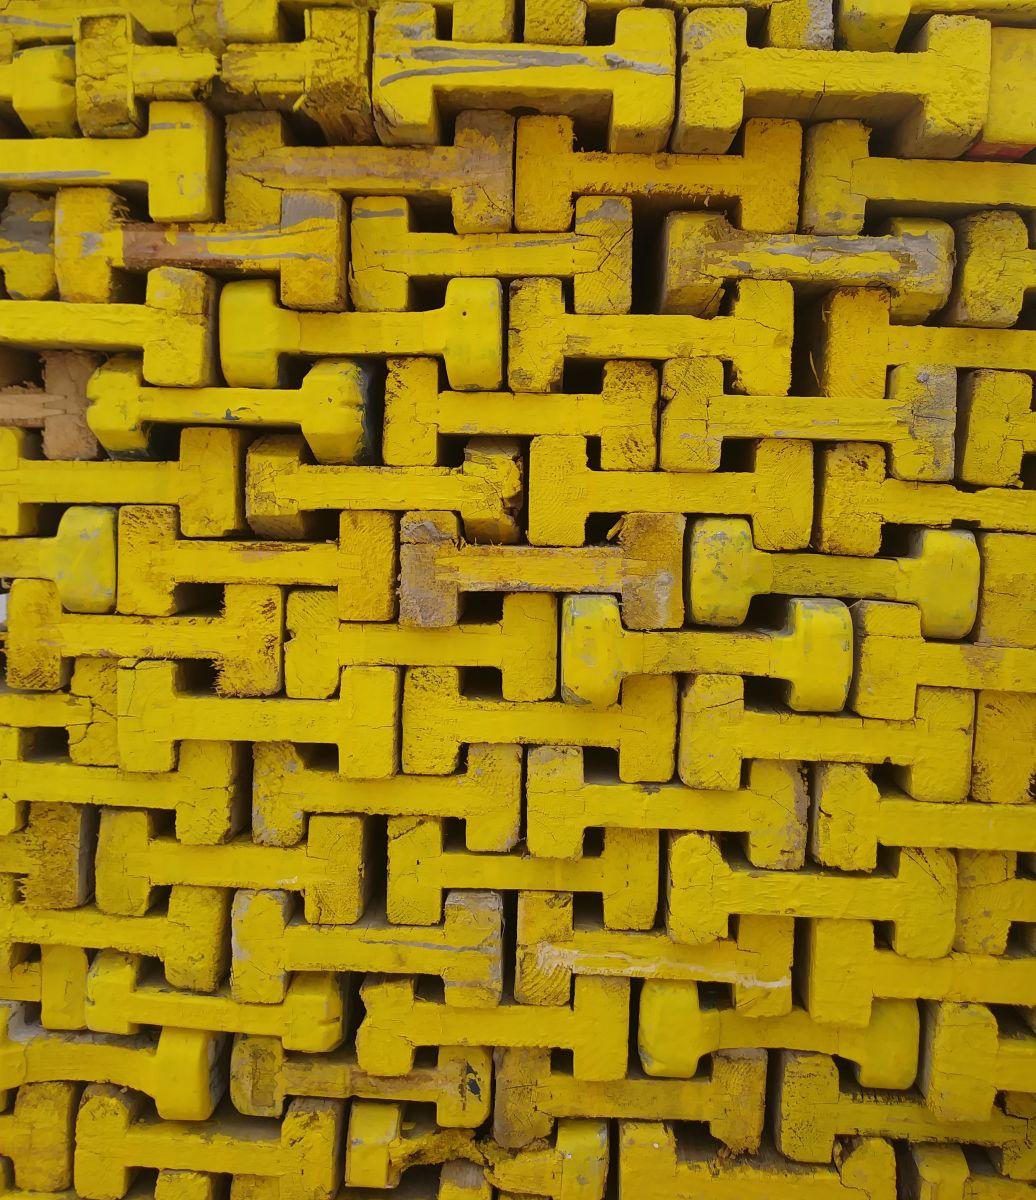 Ordnung in Gelb